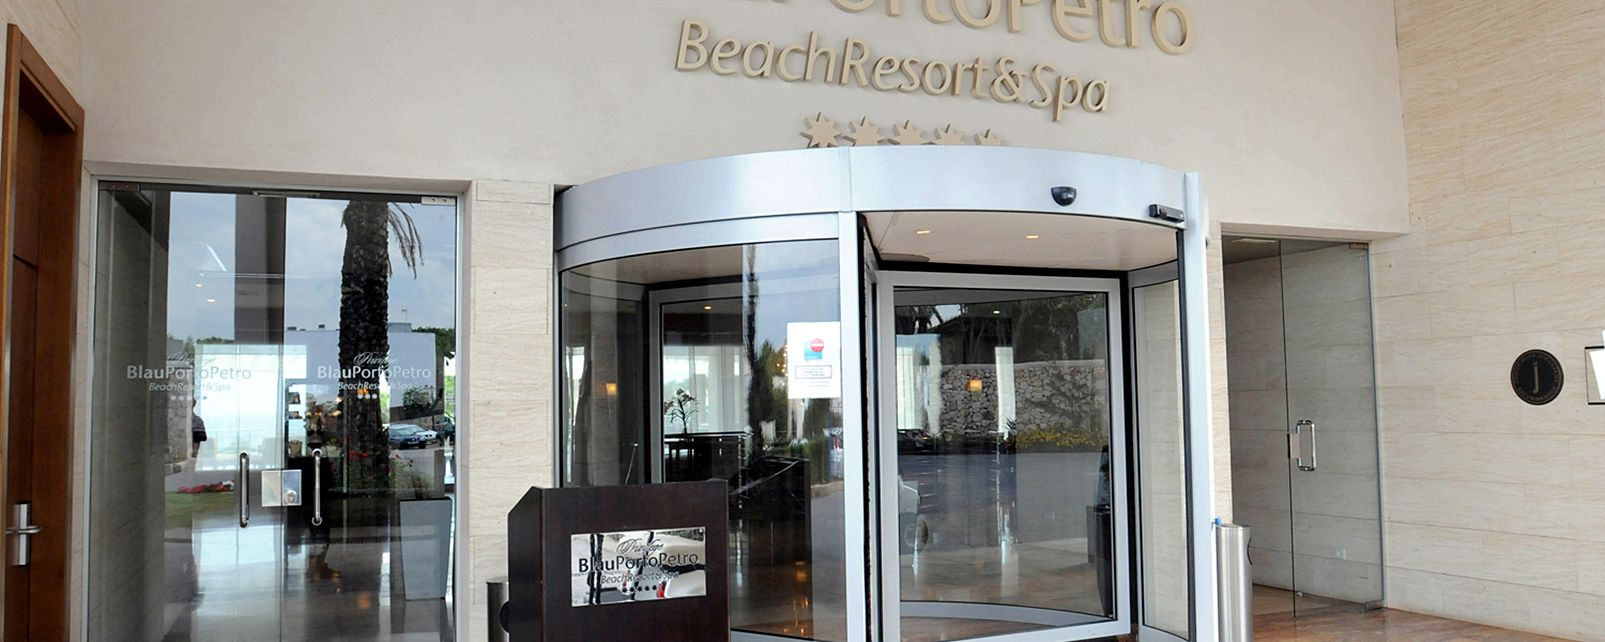 Hotel Blau PortoPetro Beach Resort Spa